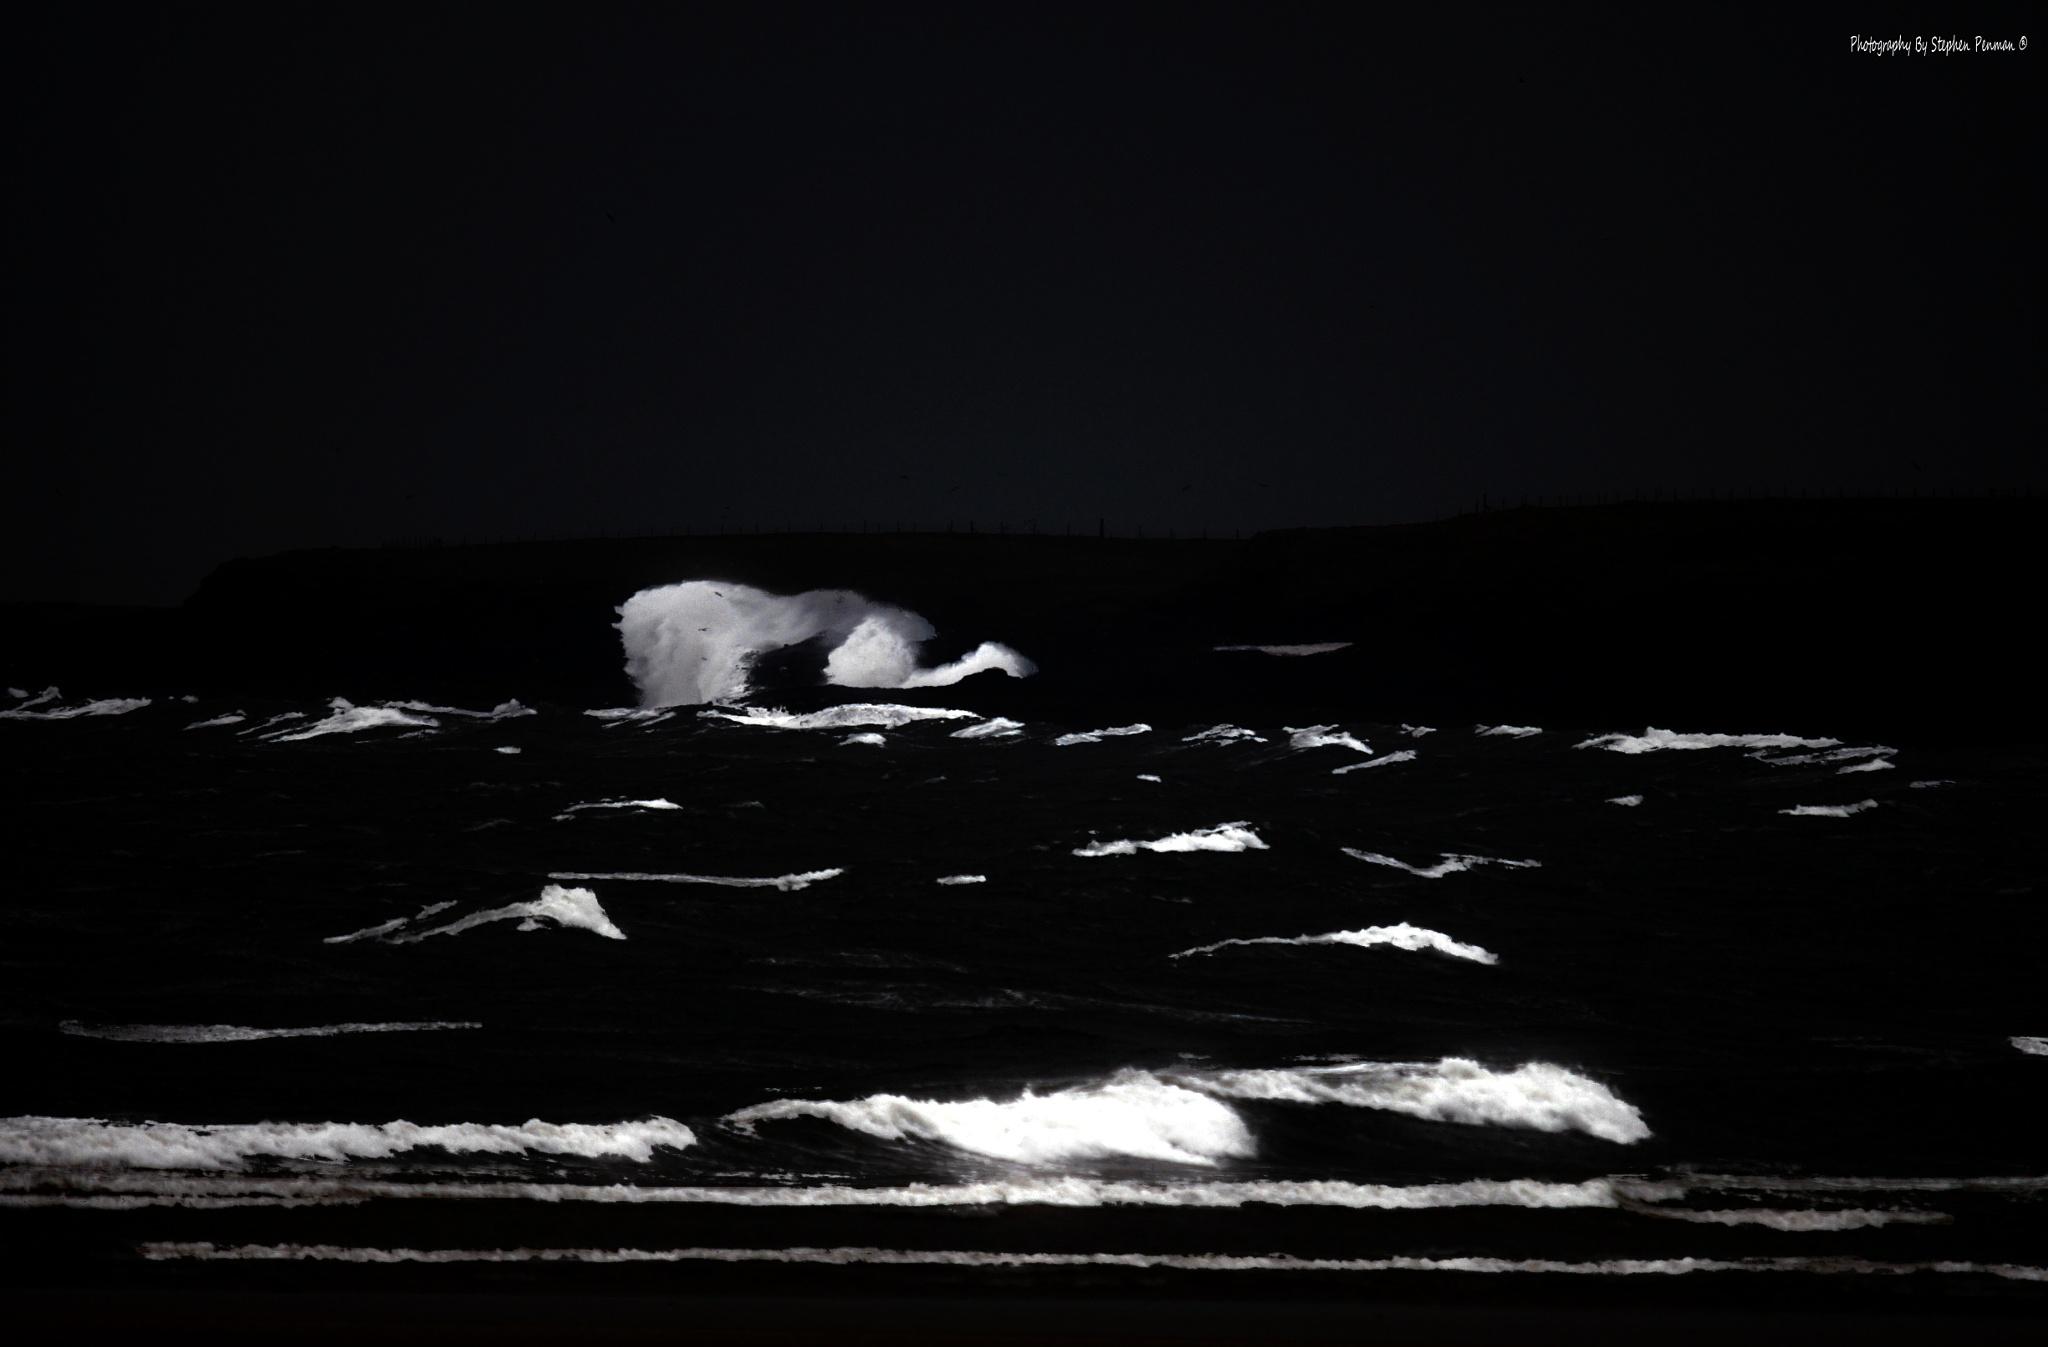 Untitled by stephen.penman.77